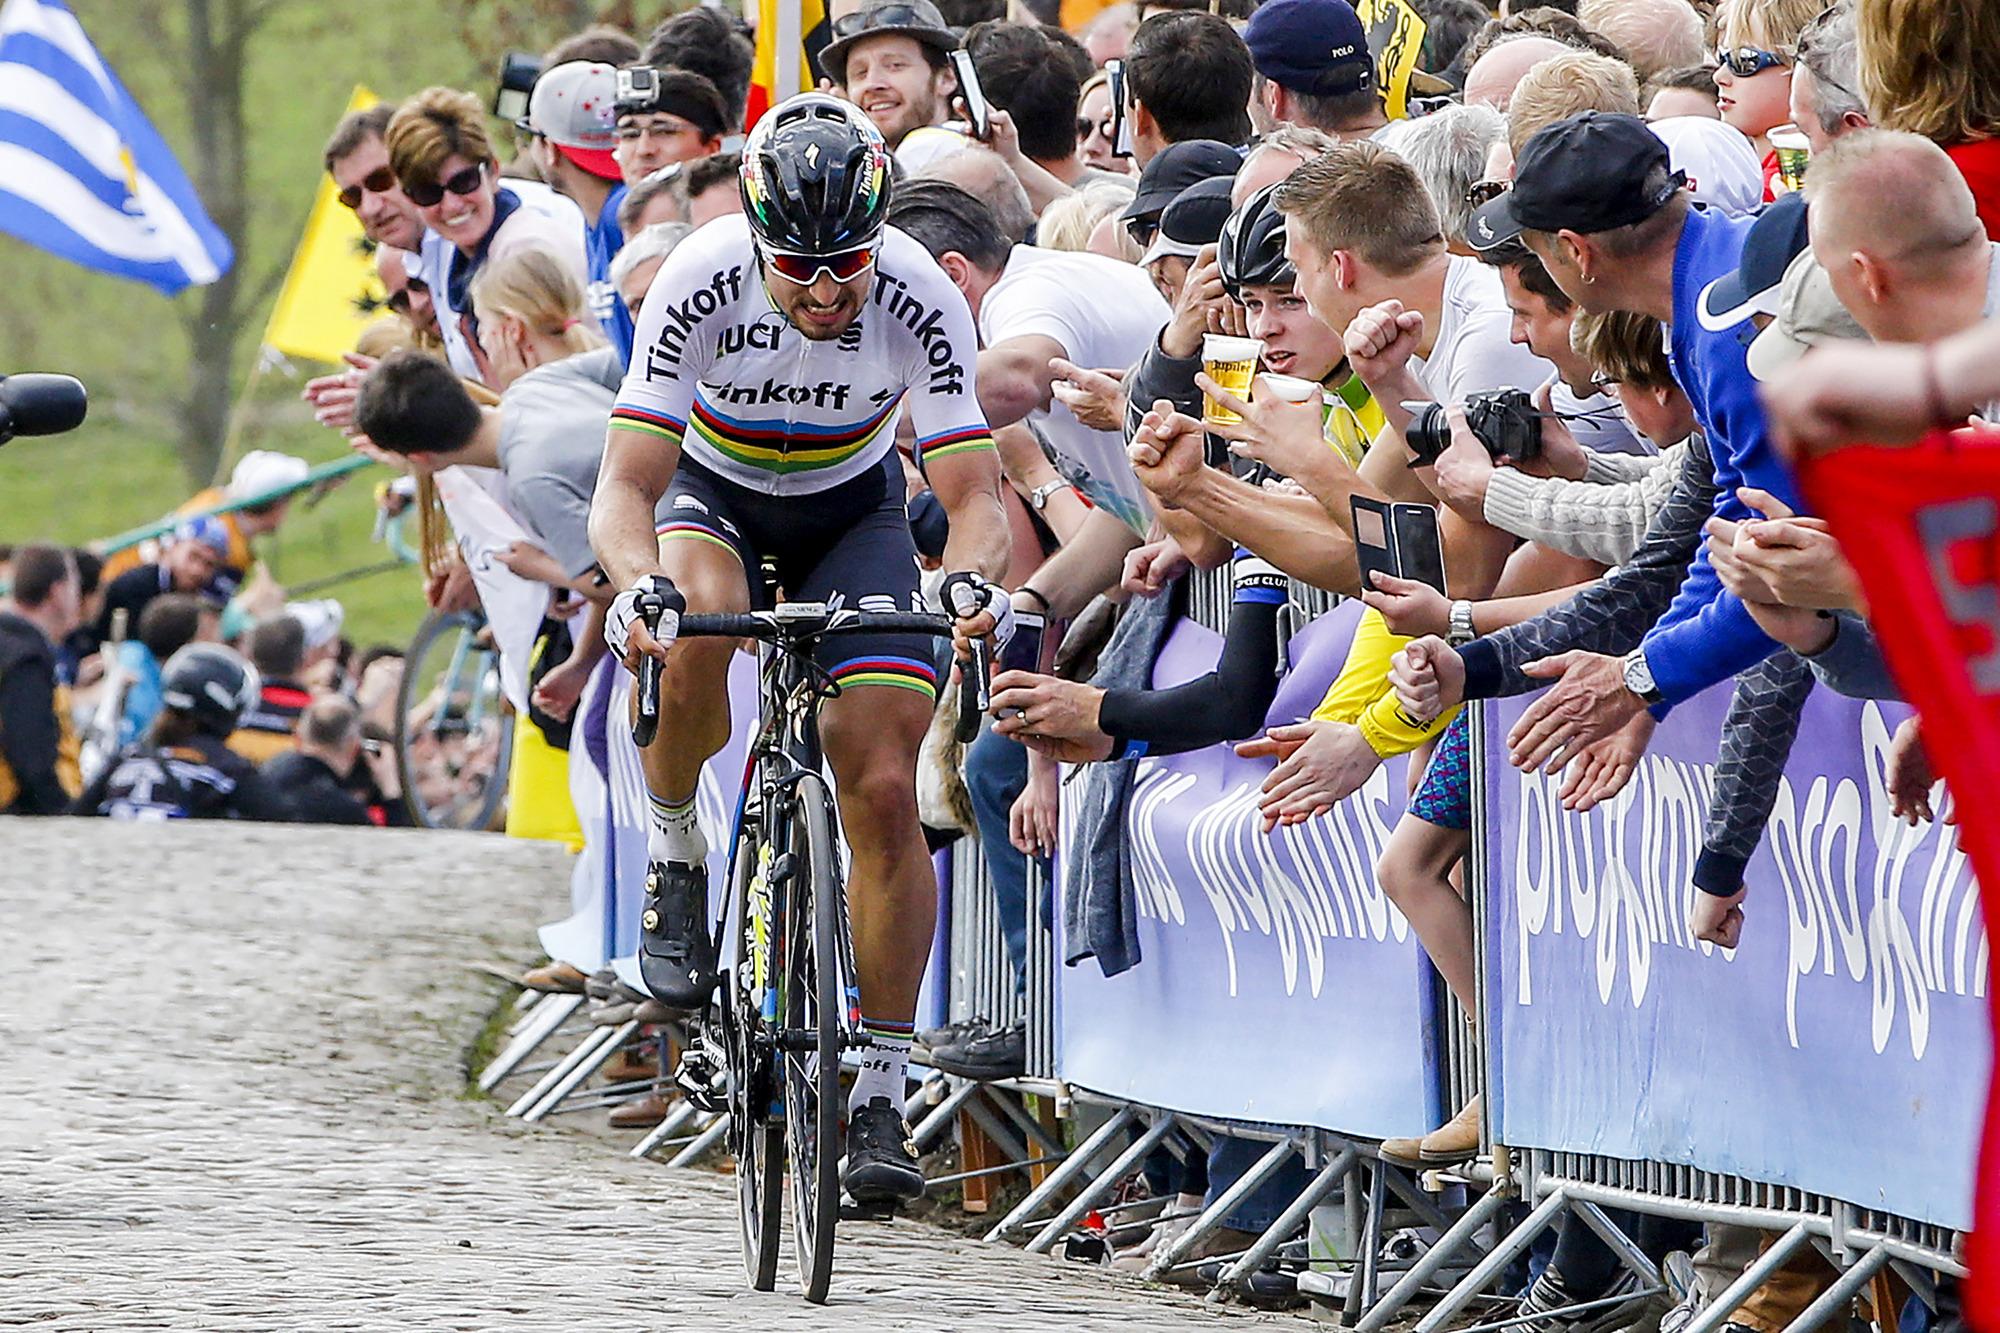 Giro delle Fiandre 2016 - 100a Edizione - Ronde Van Vlaanderen - Tour of Flanders - Brugge - Oudenaarde 255,9 km - 03/04/2016 - Peter Sagan (Tinkoff) - foto Luca Bettini/BettiniPhoto©2016